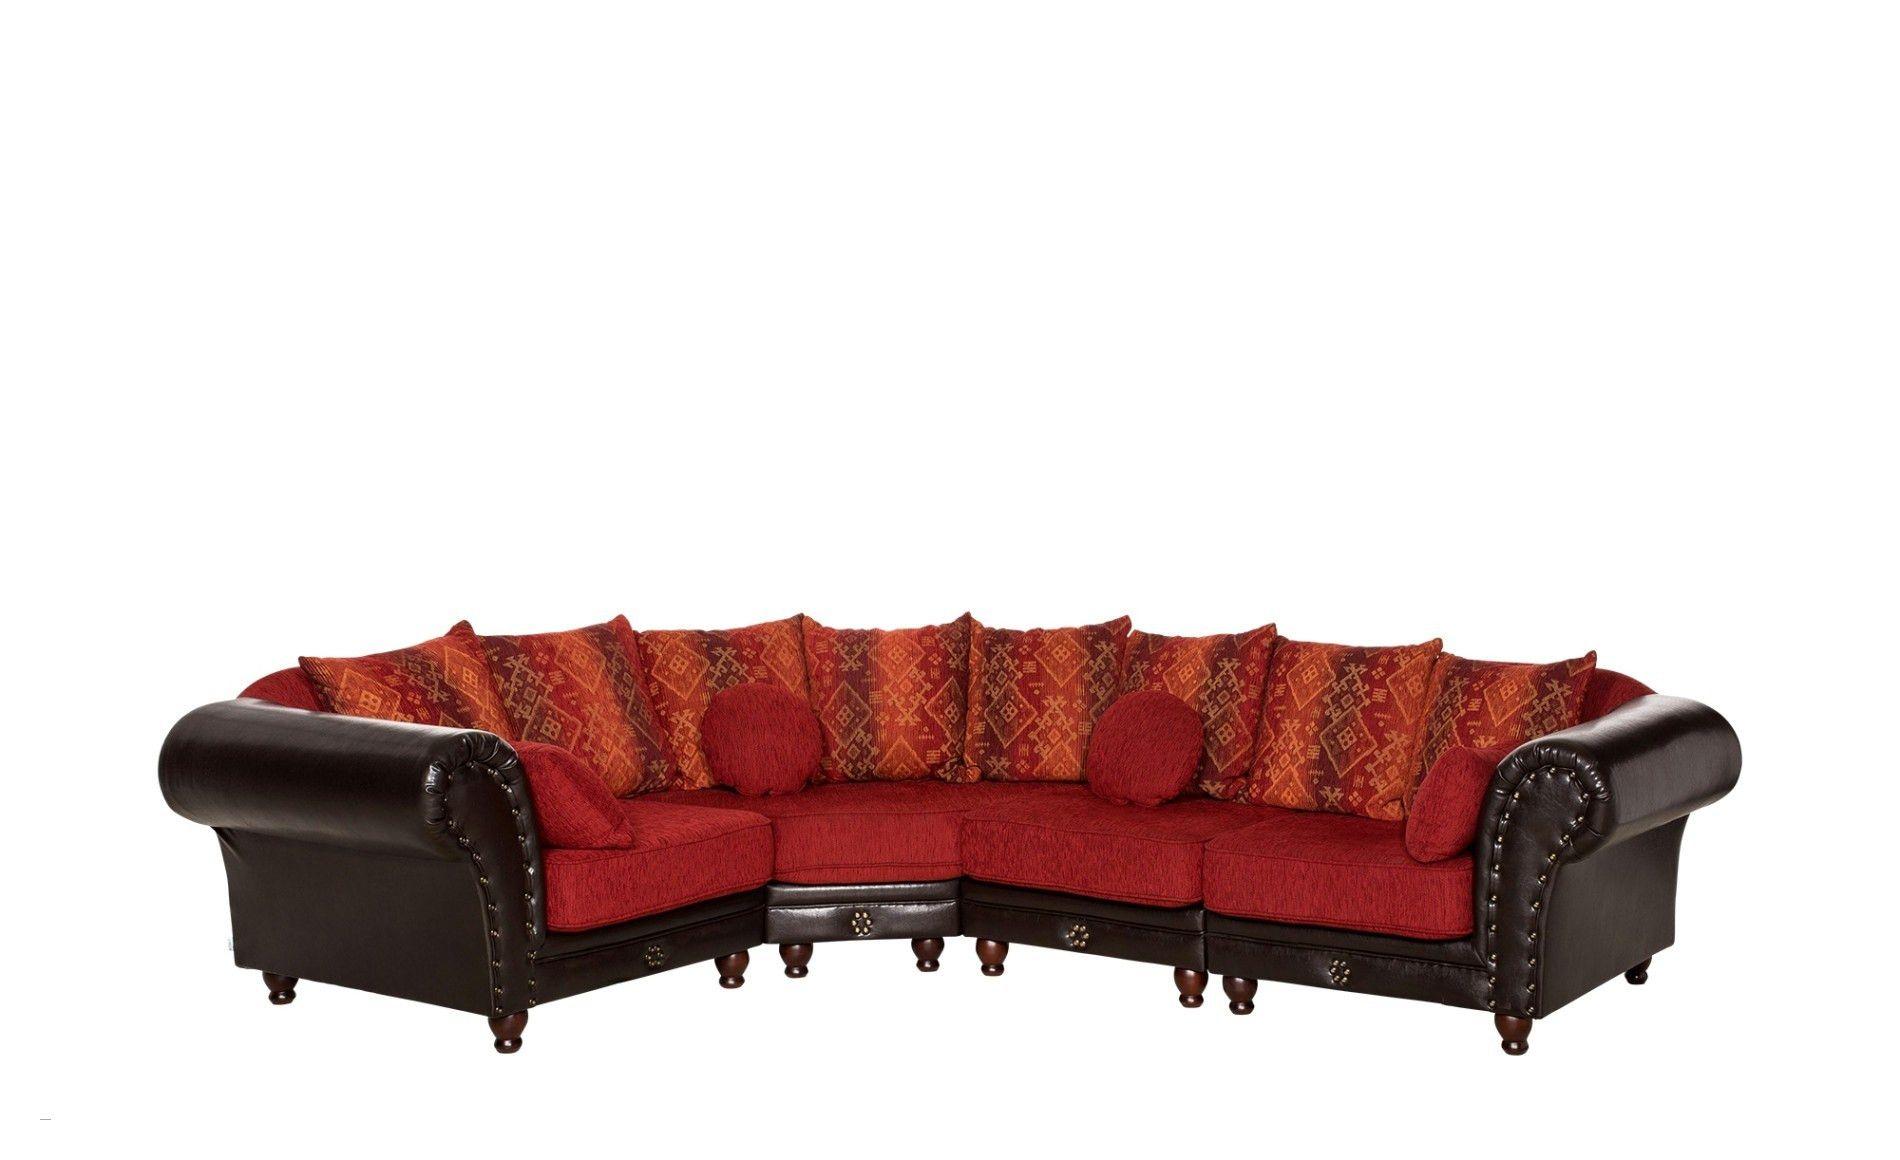 Full Size of Kolonialstil Sofa Herrlich Gebraucht Couch Bigsofa Xxl Sessel Big Eck Comfortmaster Mit Bettkasten Lounge Garten Großes Recamiere Stressless Graues Sofa Kolonialstil Sofa